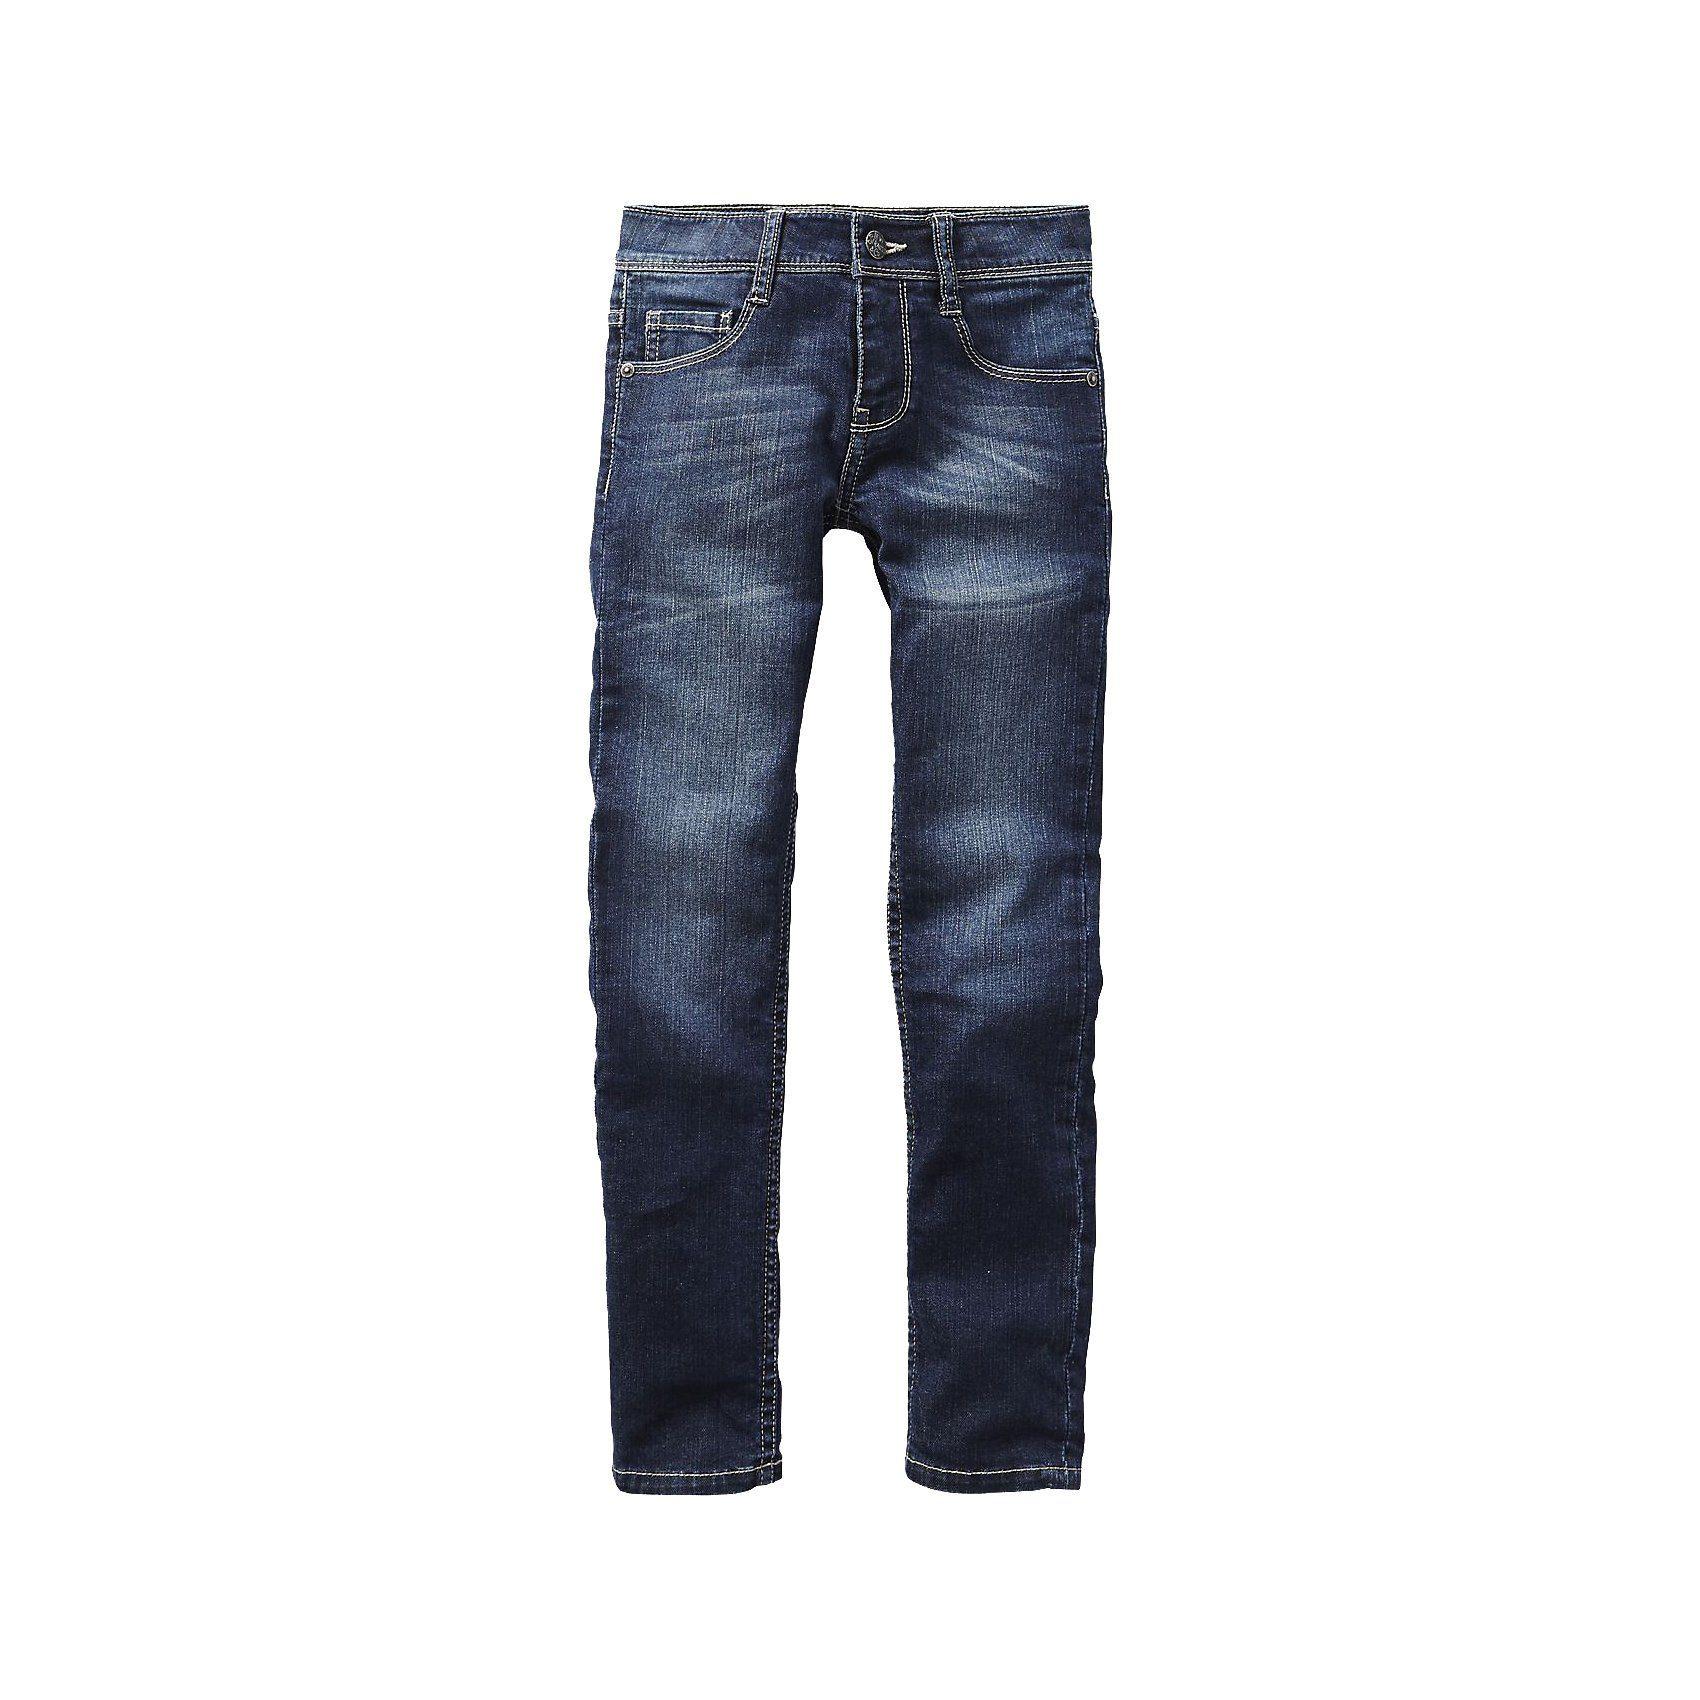 Levi's® Jeans Skinny fit für Mädchen